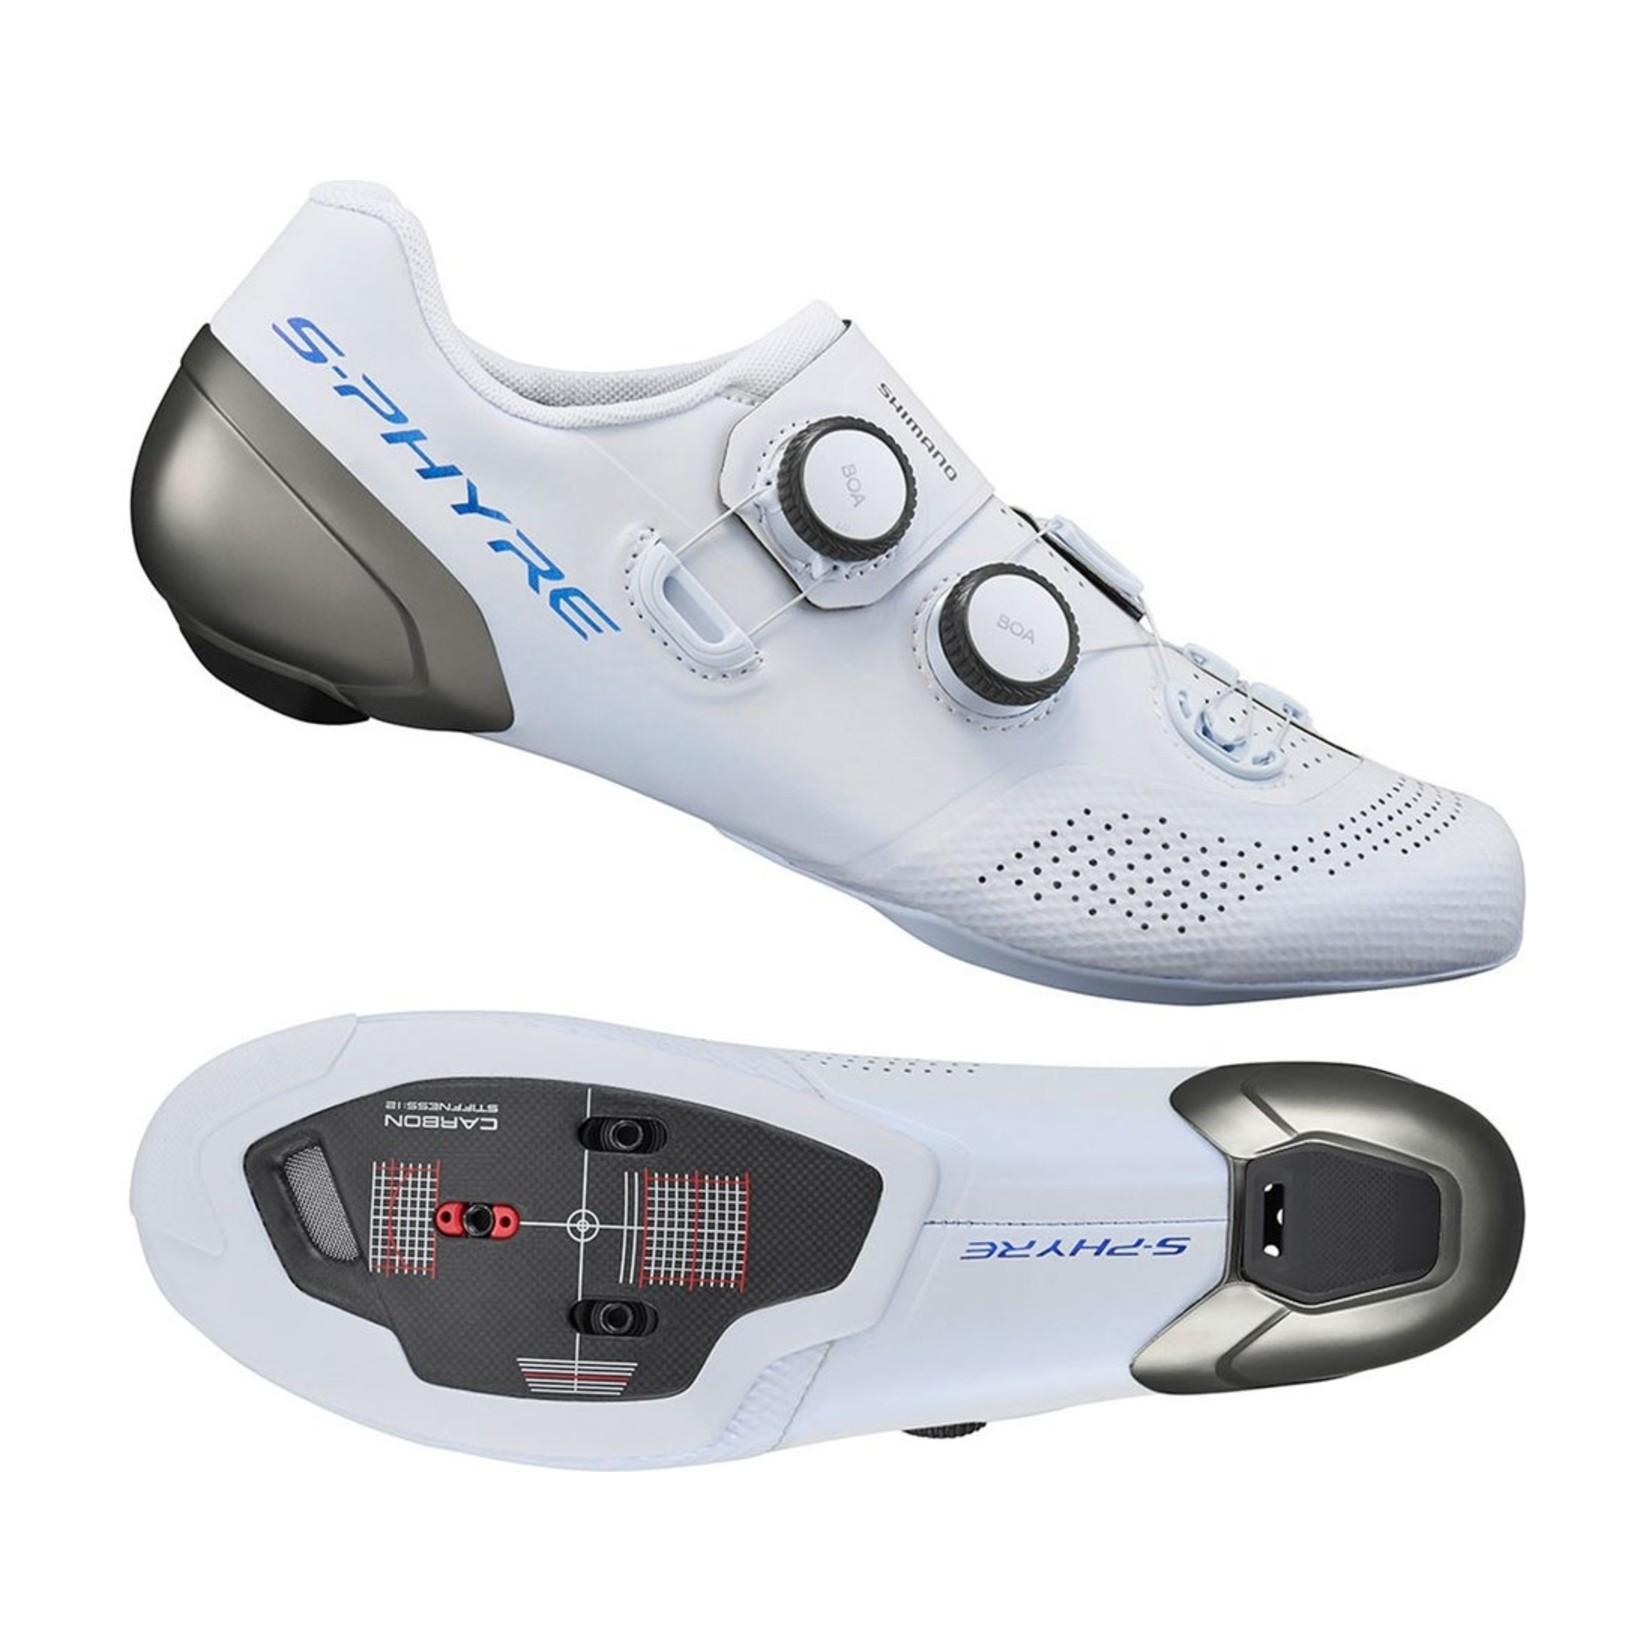 Shimano SHIMANO S-Phyre SH-RC902 Shoes - White